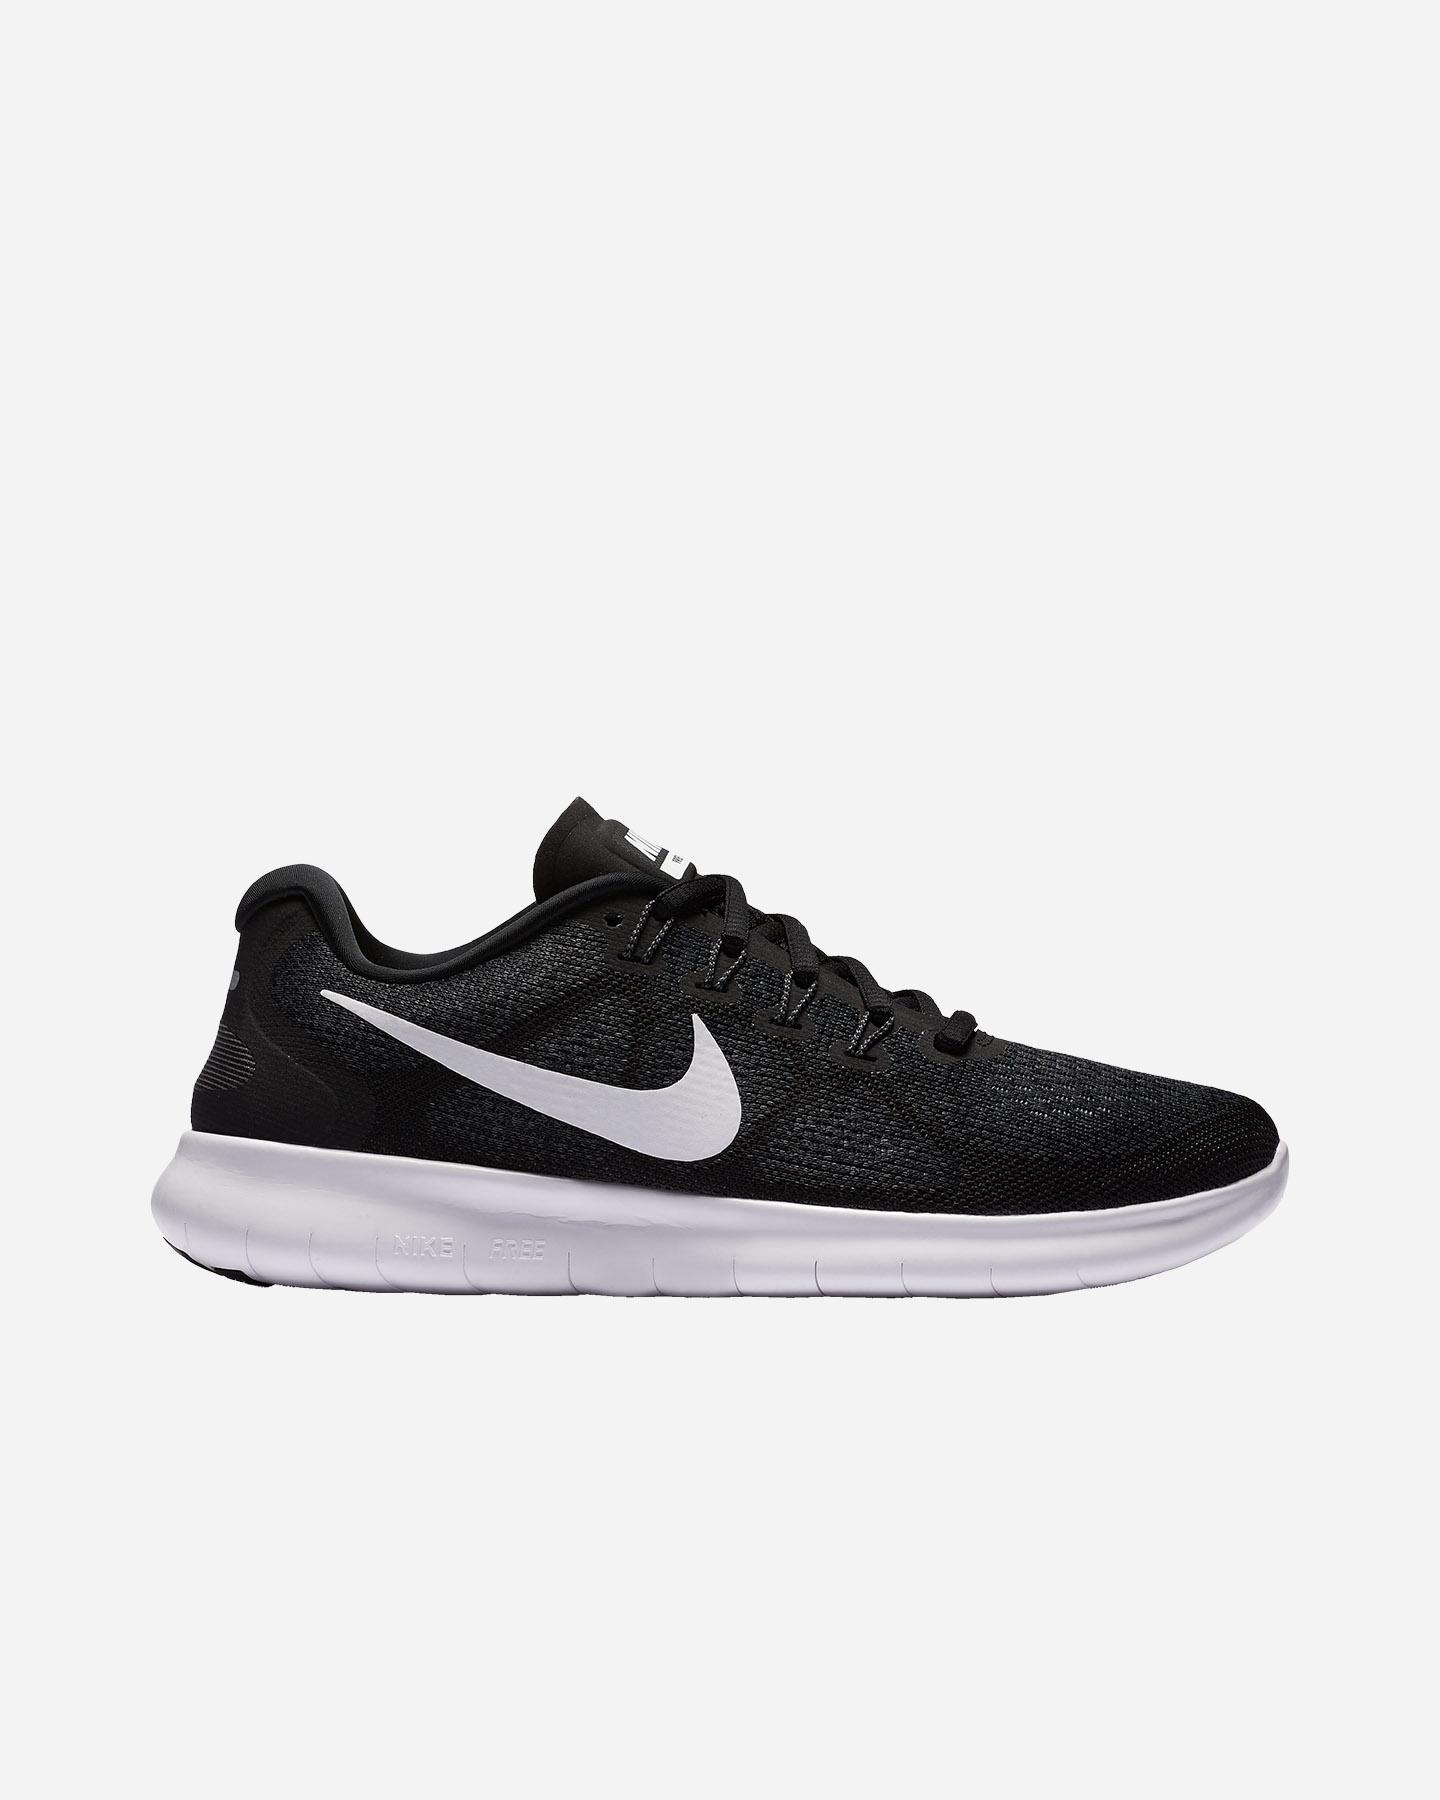 Nike Scarpe W Run Su Sportive Free Cisalfa 880840 Sport 2 4Oq7xBvO